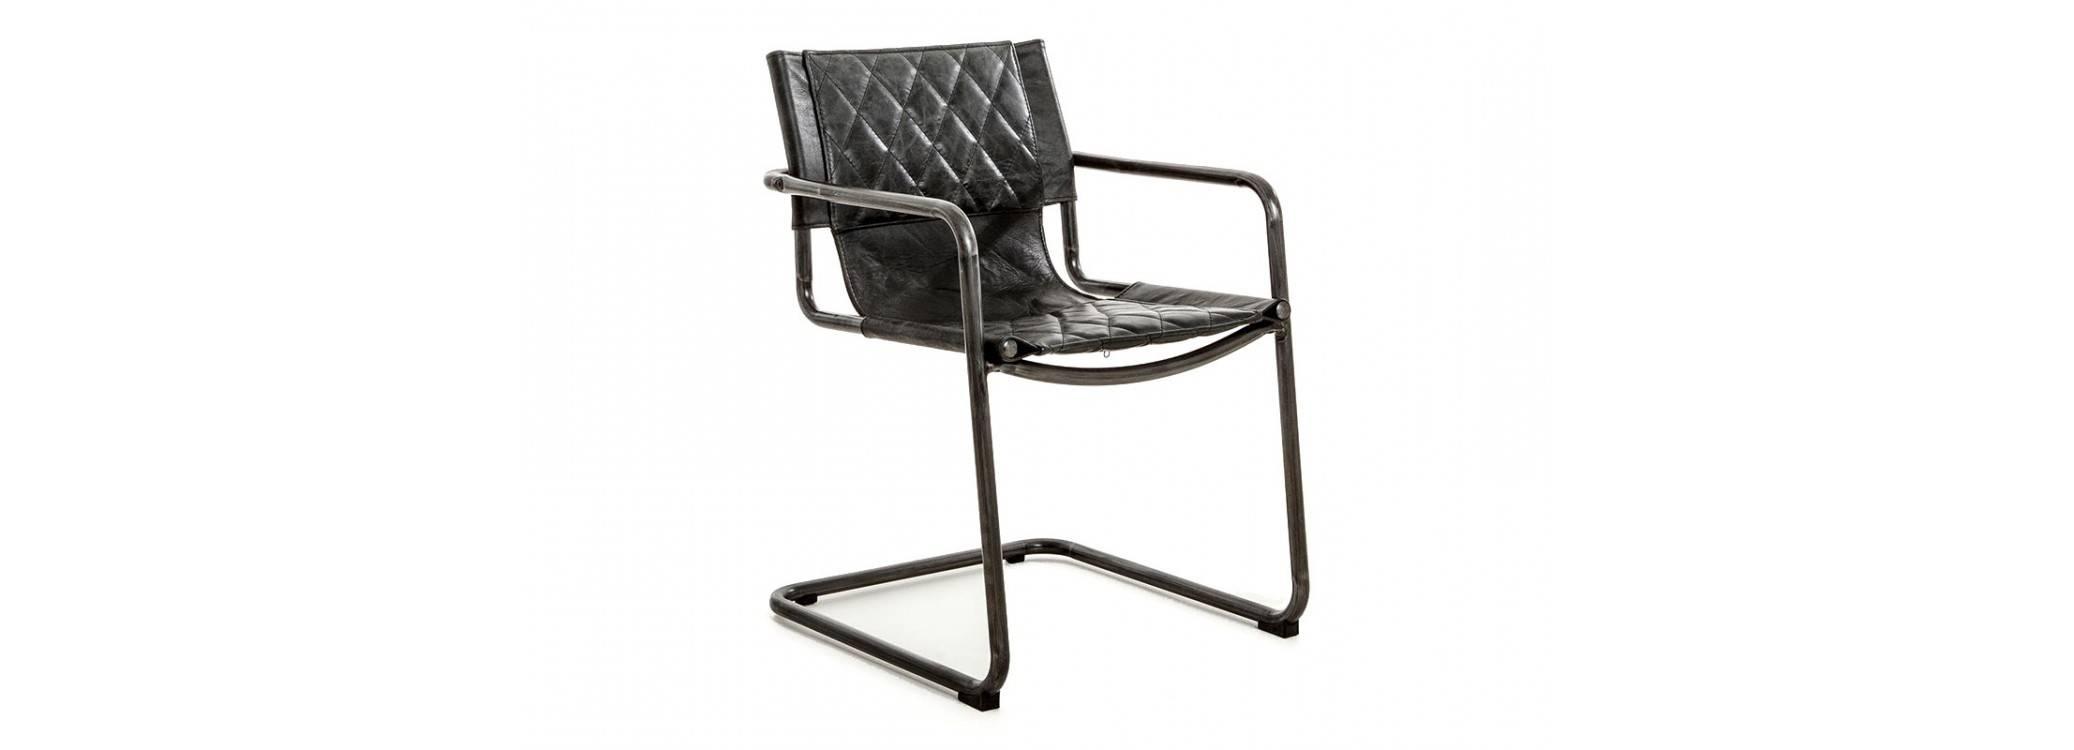 Chaise Dexter - Cuir noir et métal noir